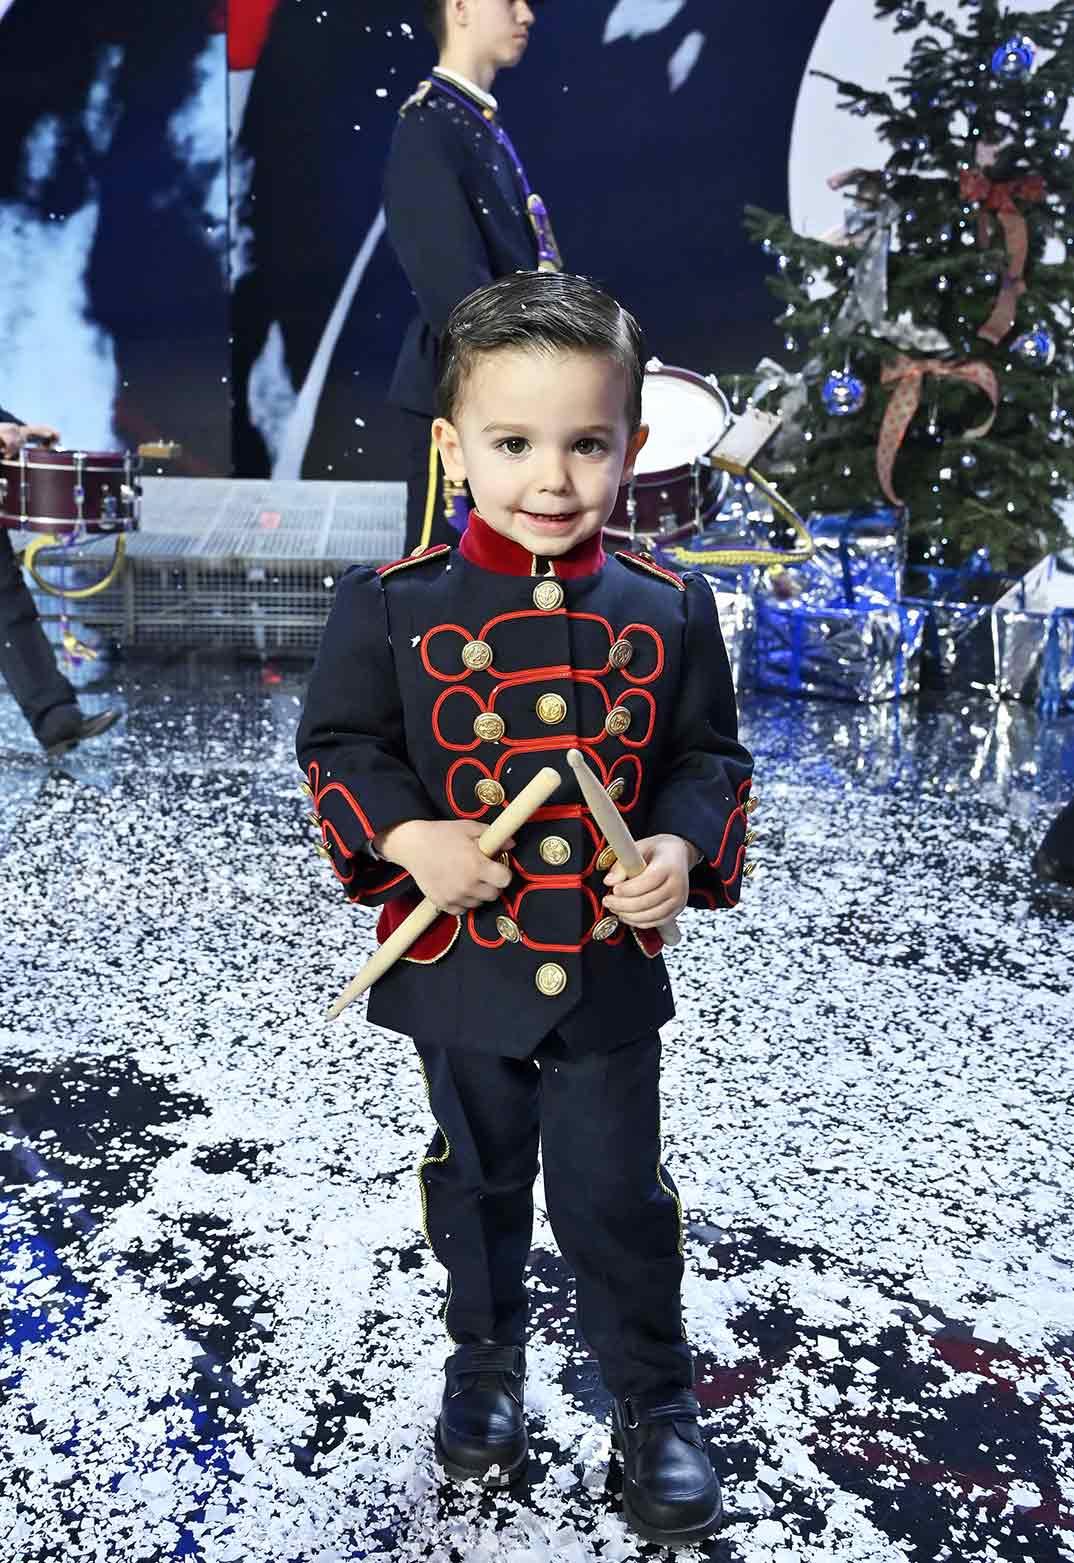 Hugo Molina - Got Talent Final © Mediaset